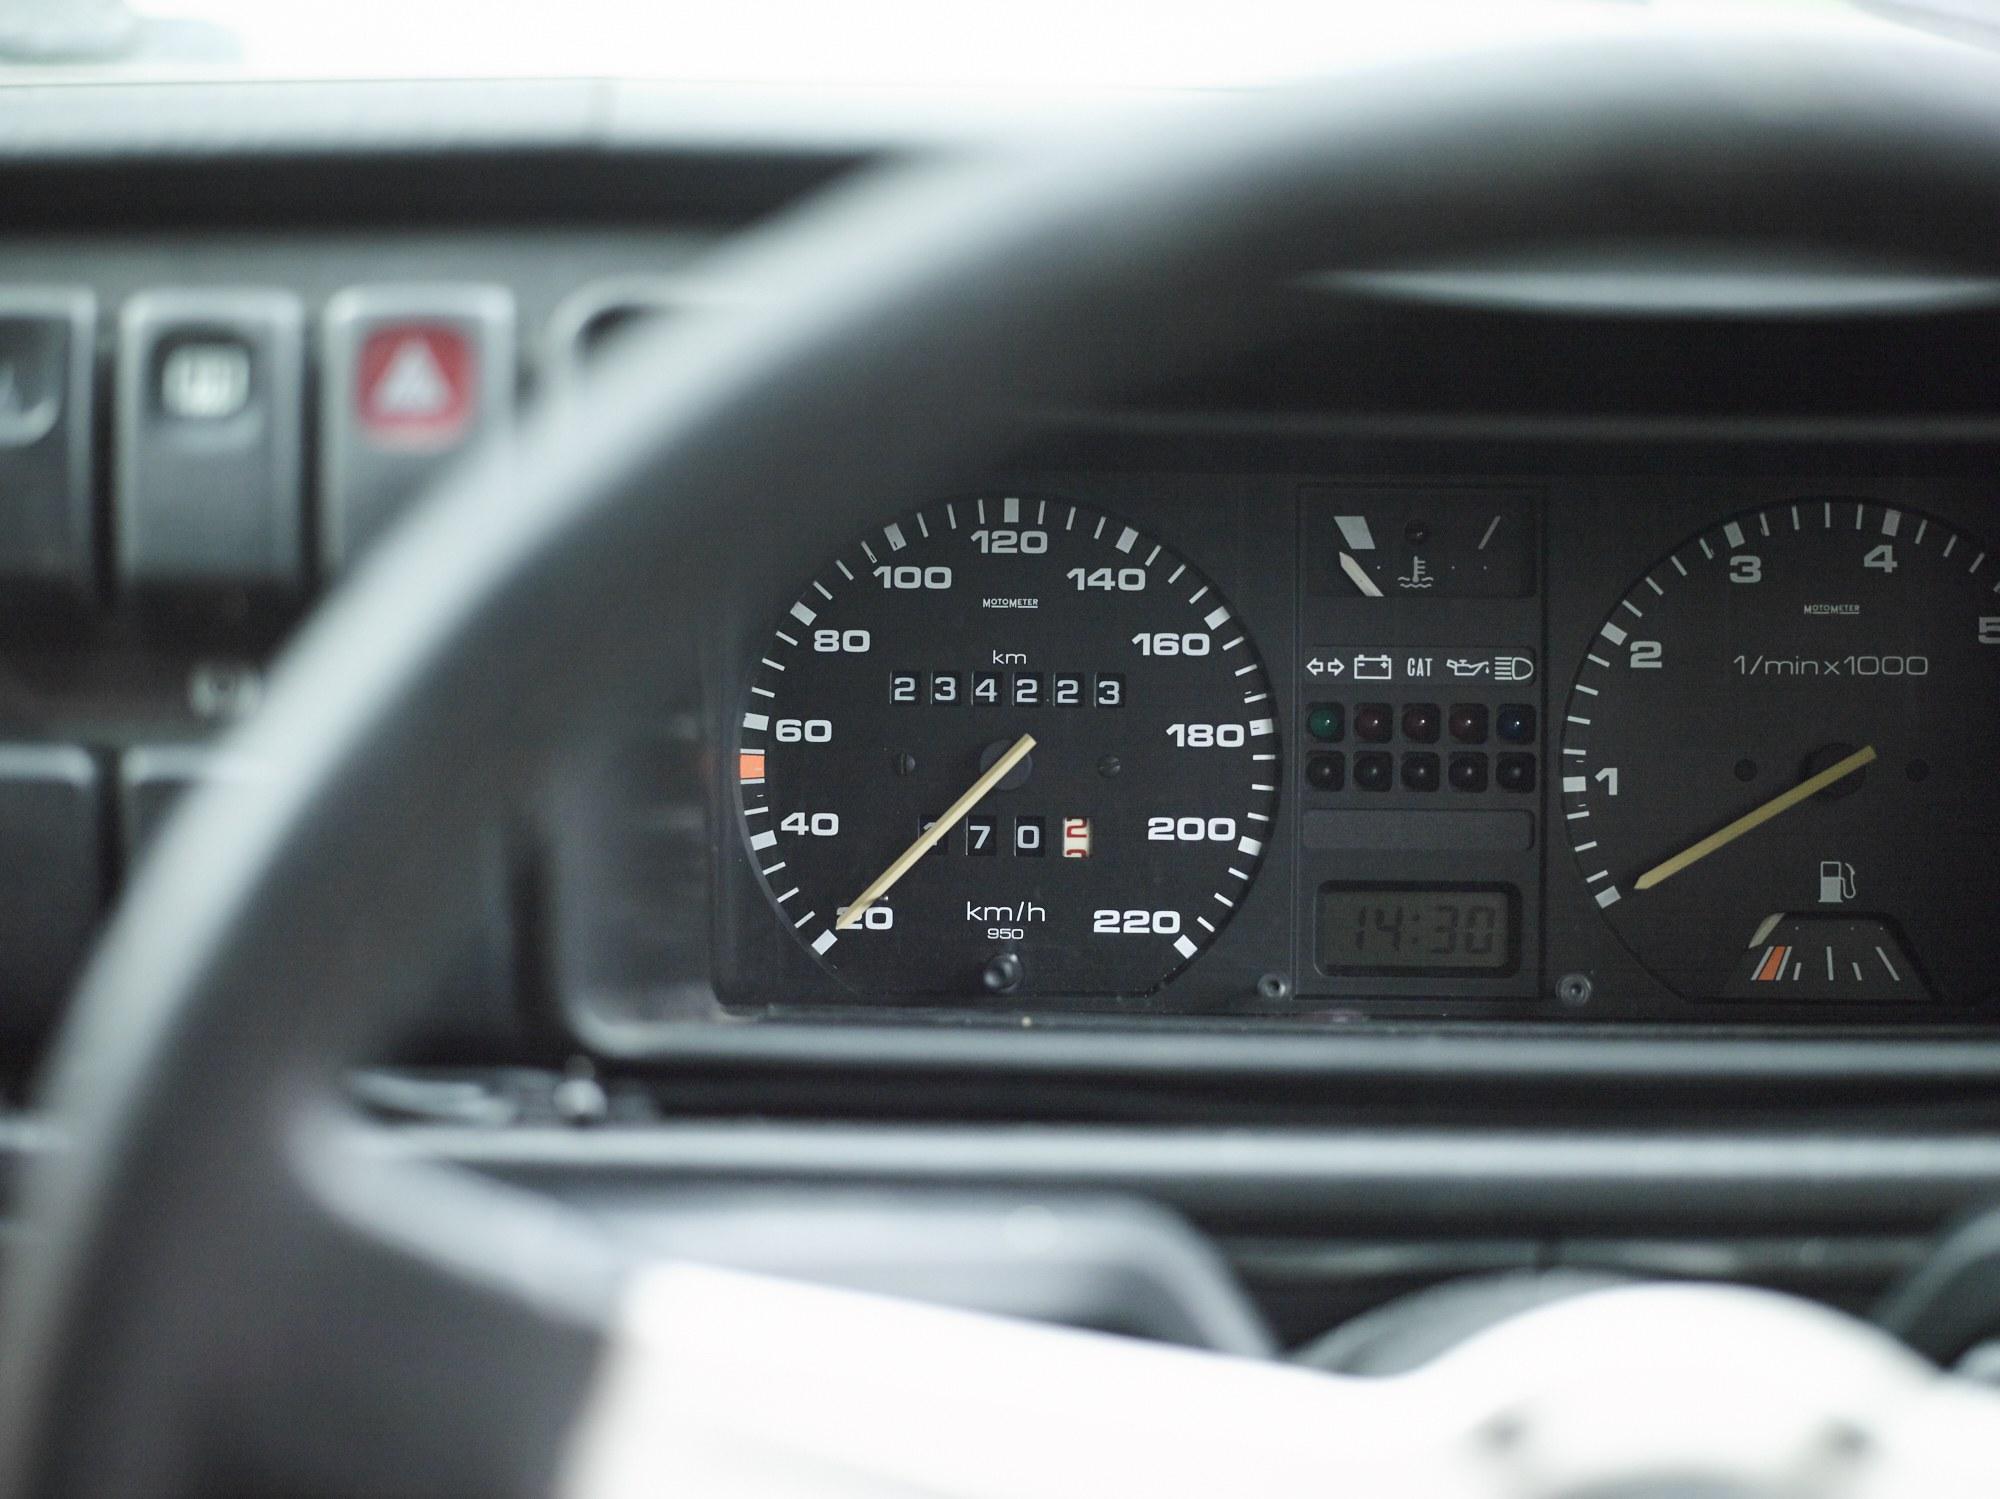 「GTIとかGLiじゃなくて大衆車っていうのがいい。」──Vol.4 Boseさん (スチャダラパー)